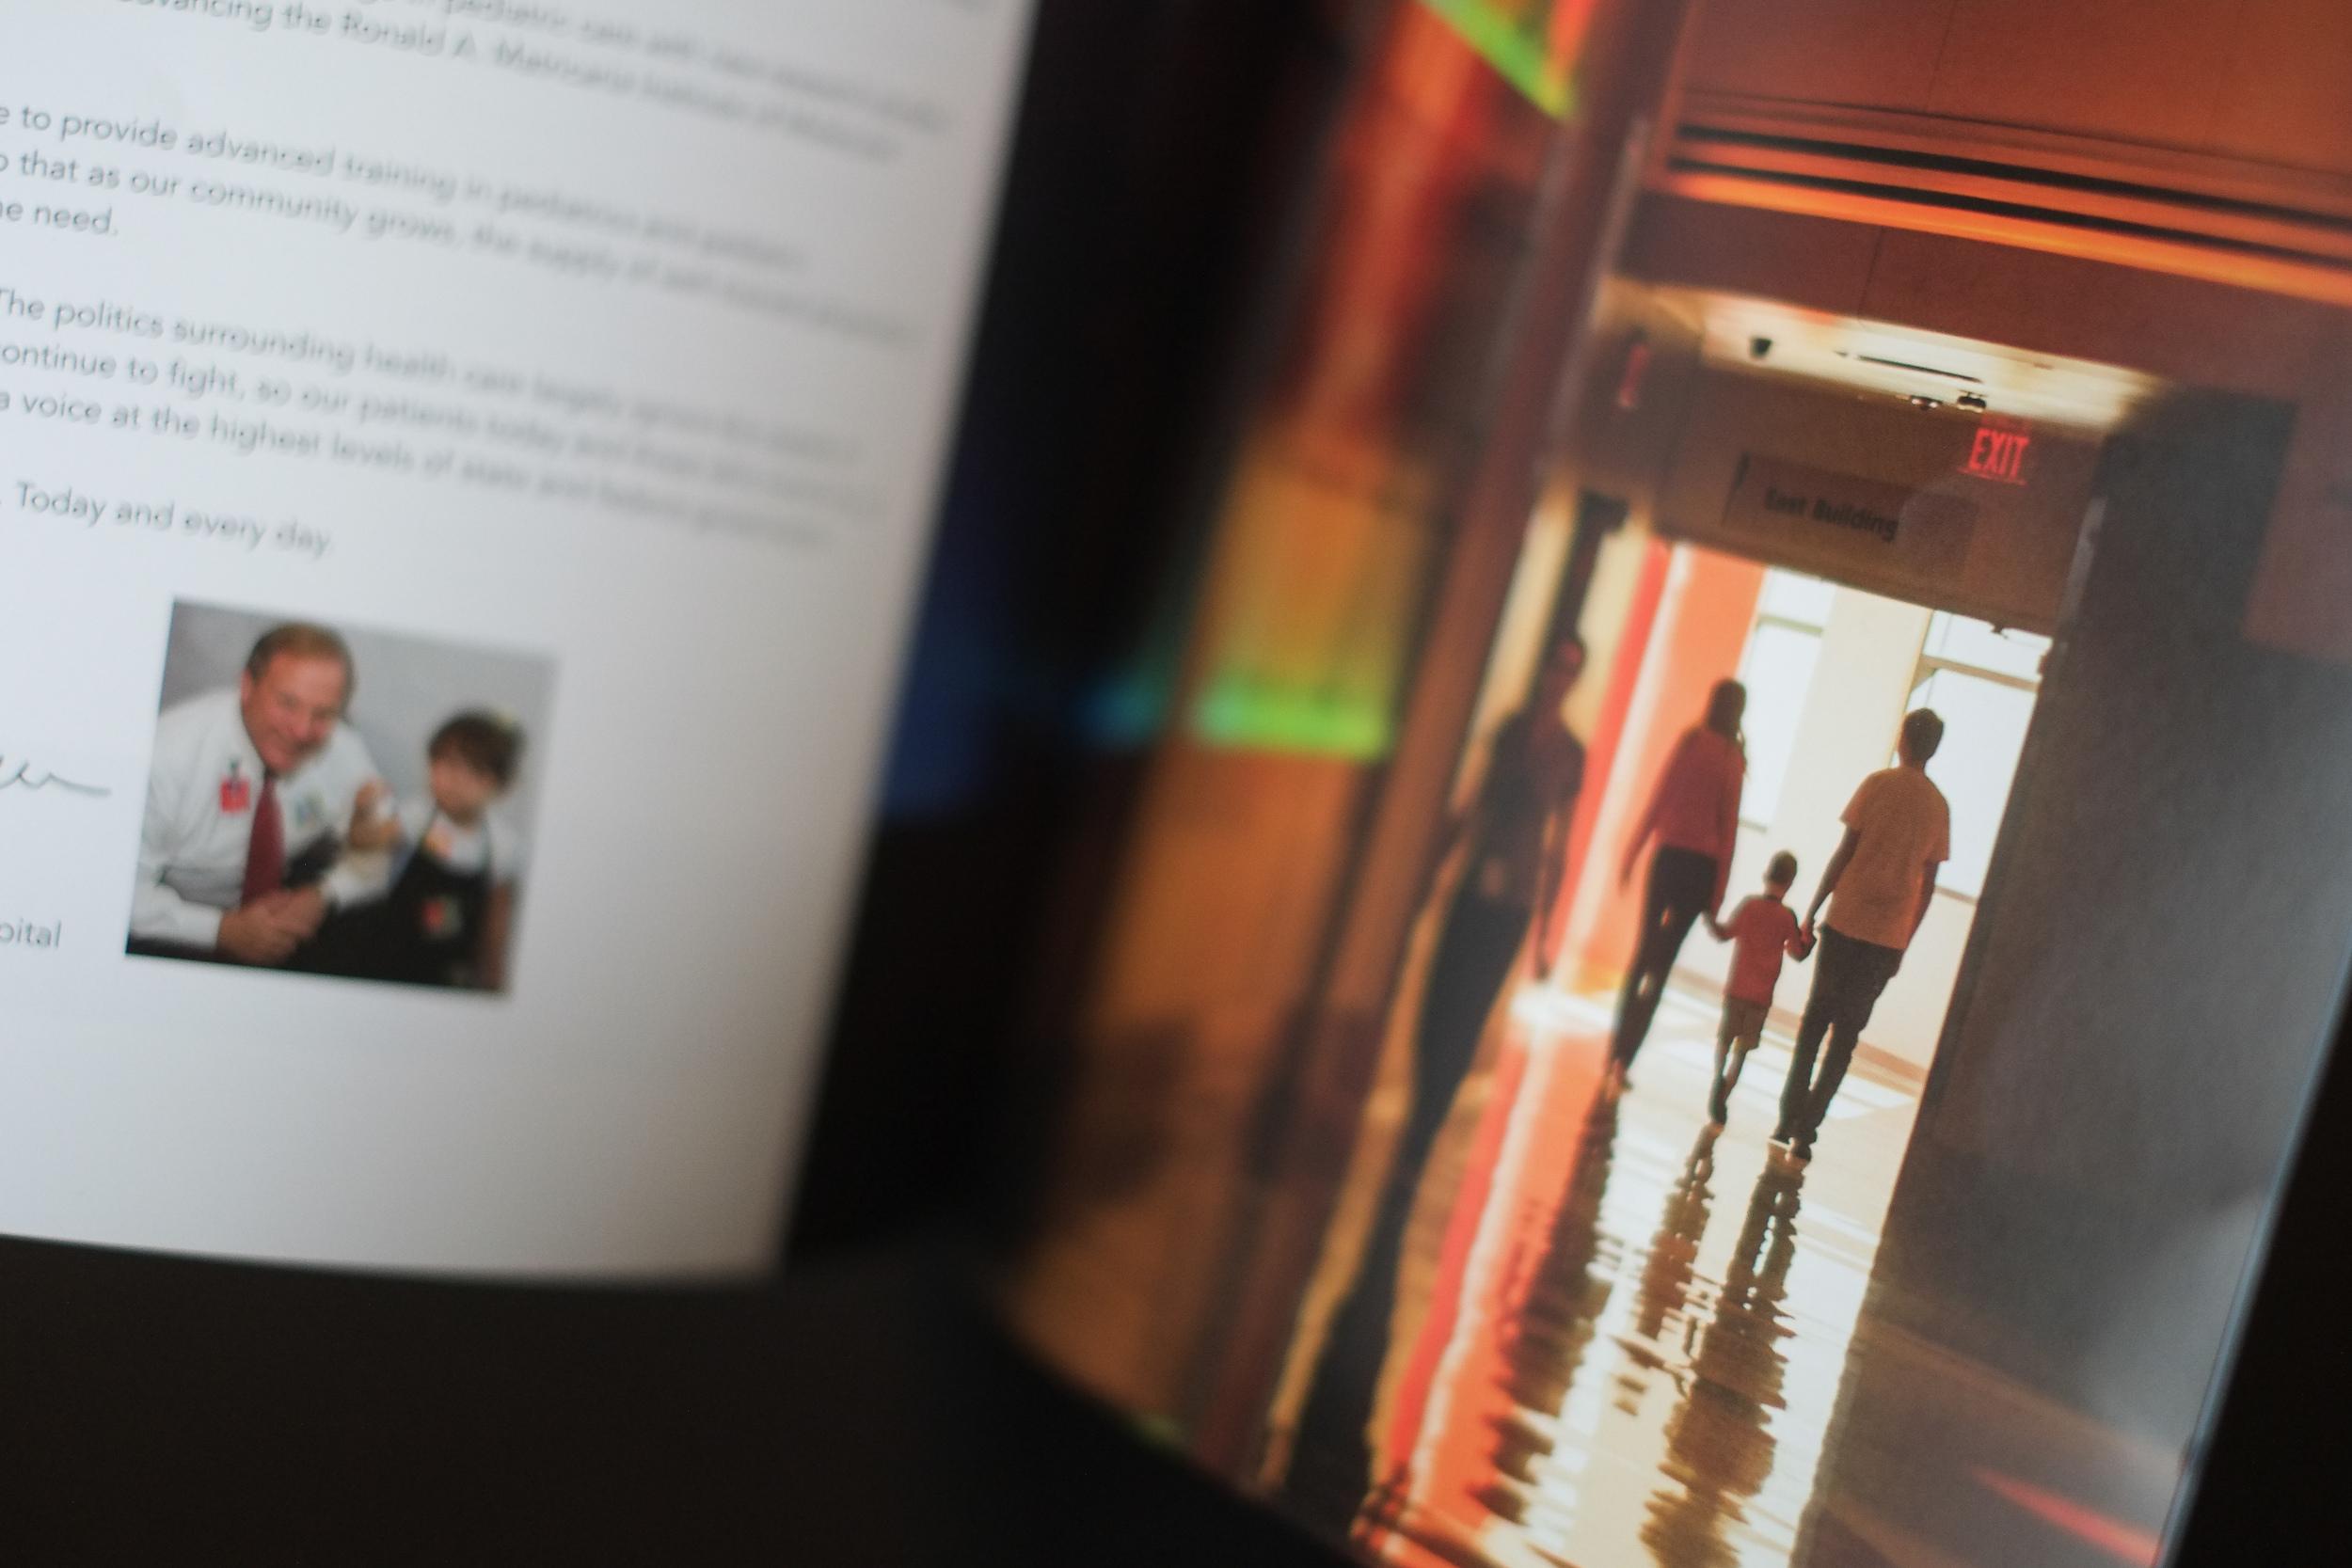 childrens-hospital-book-007.jpg